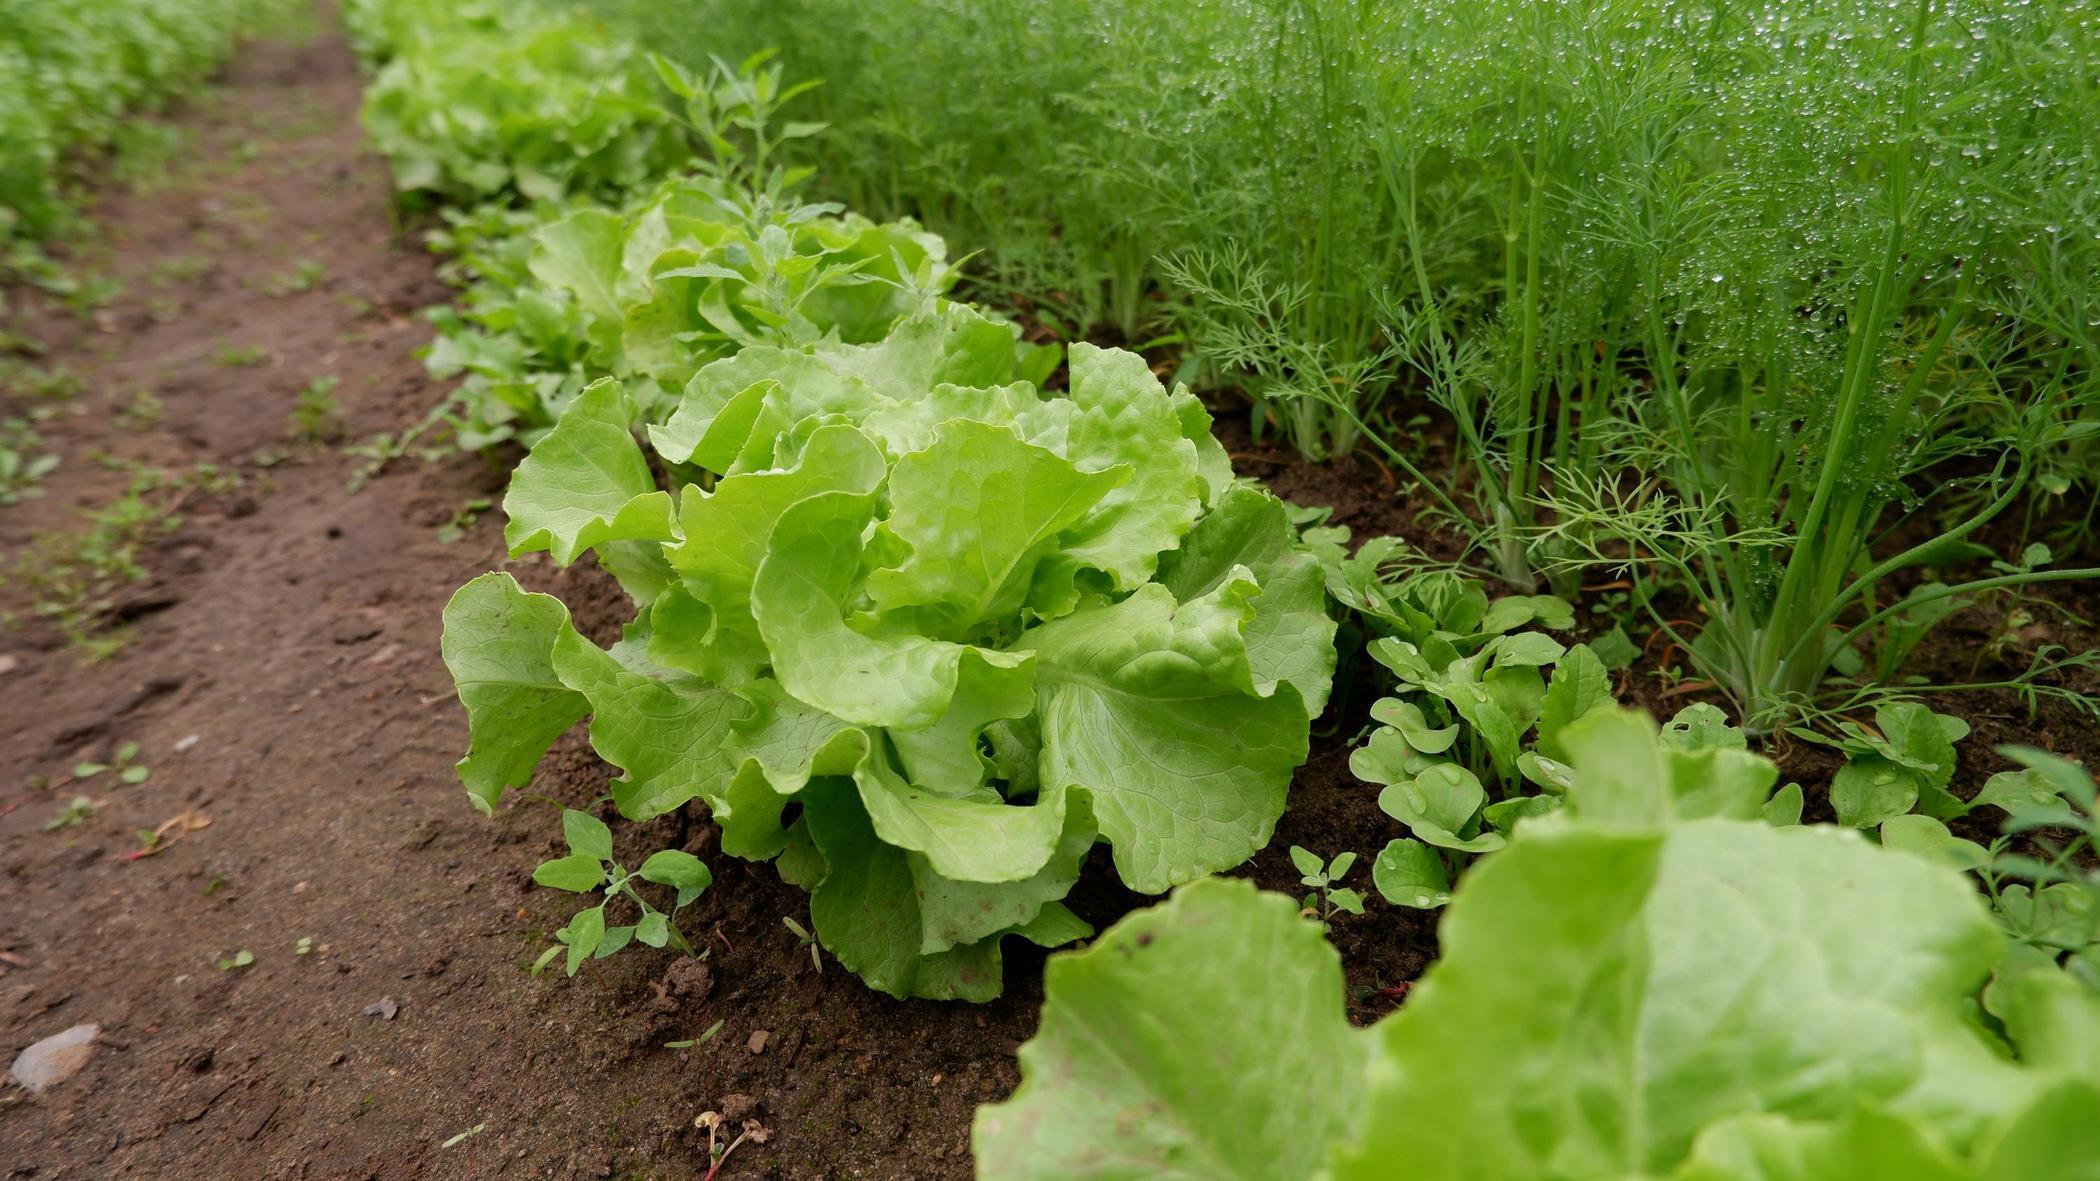 Salat neben Dill